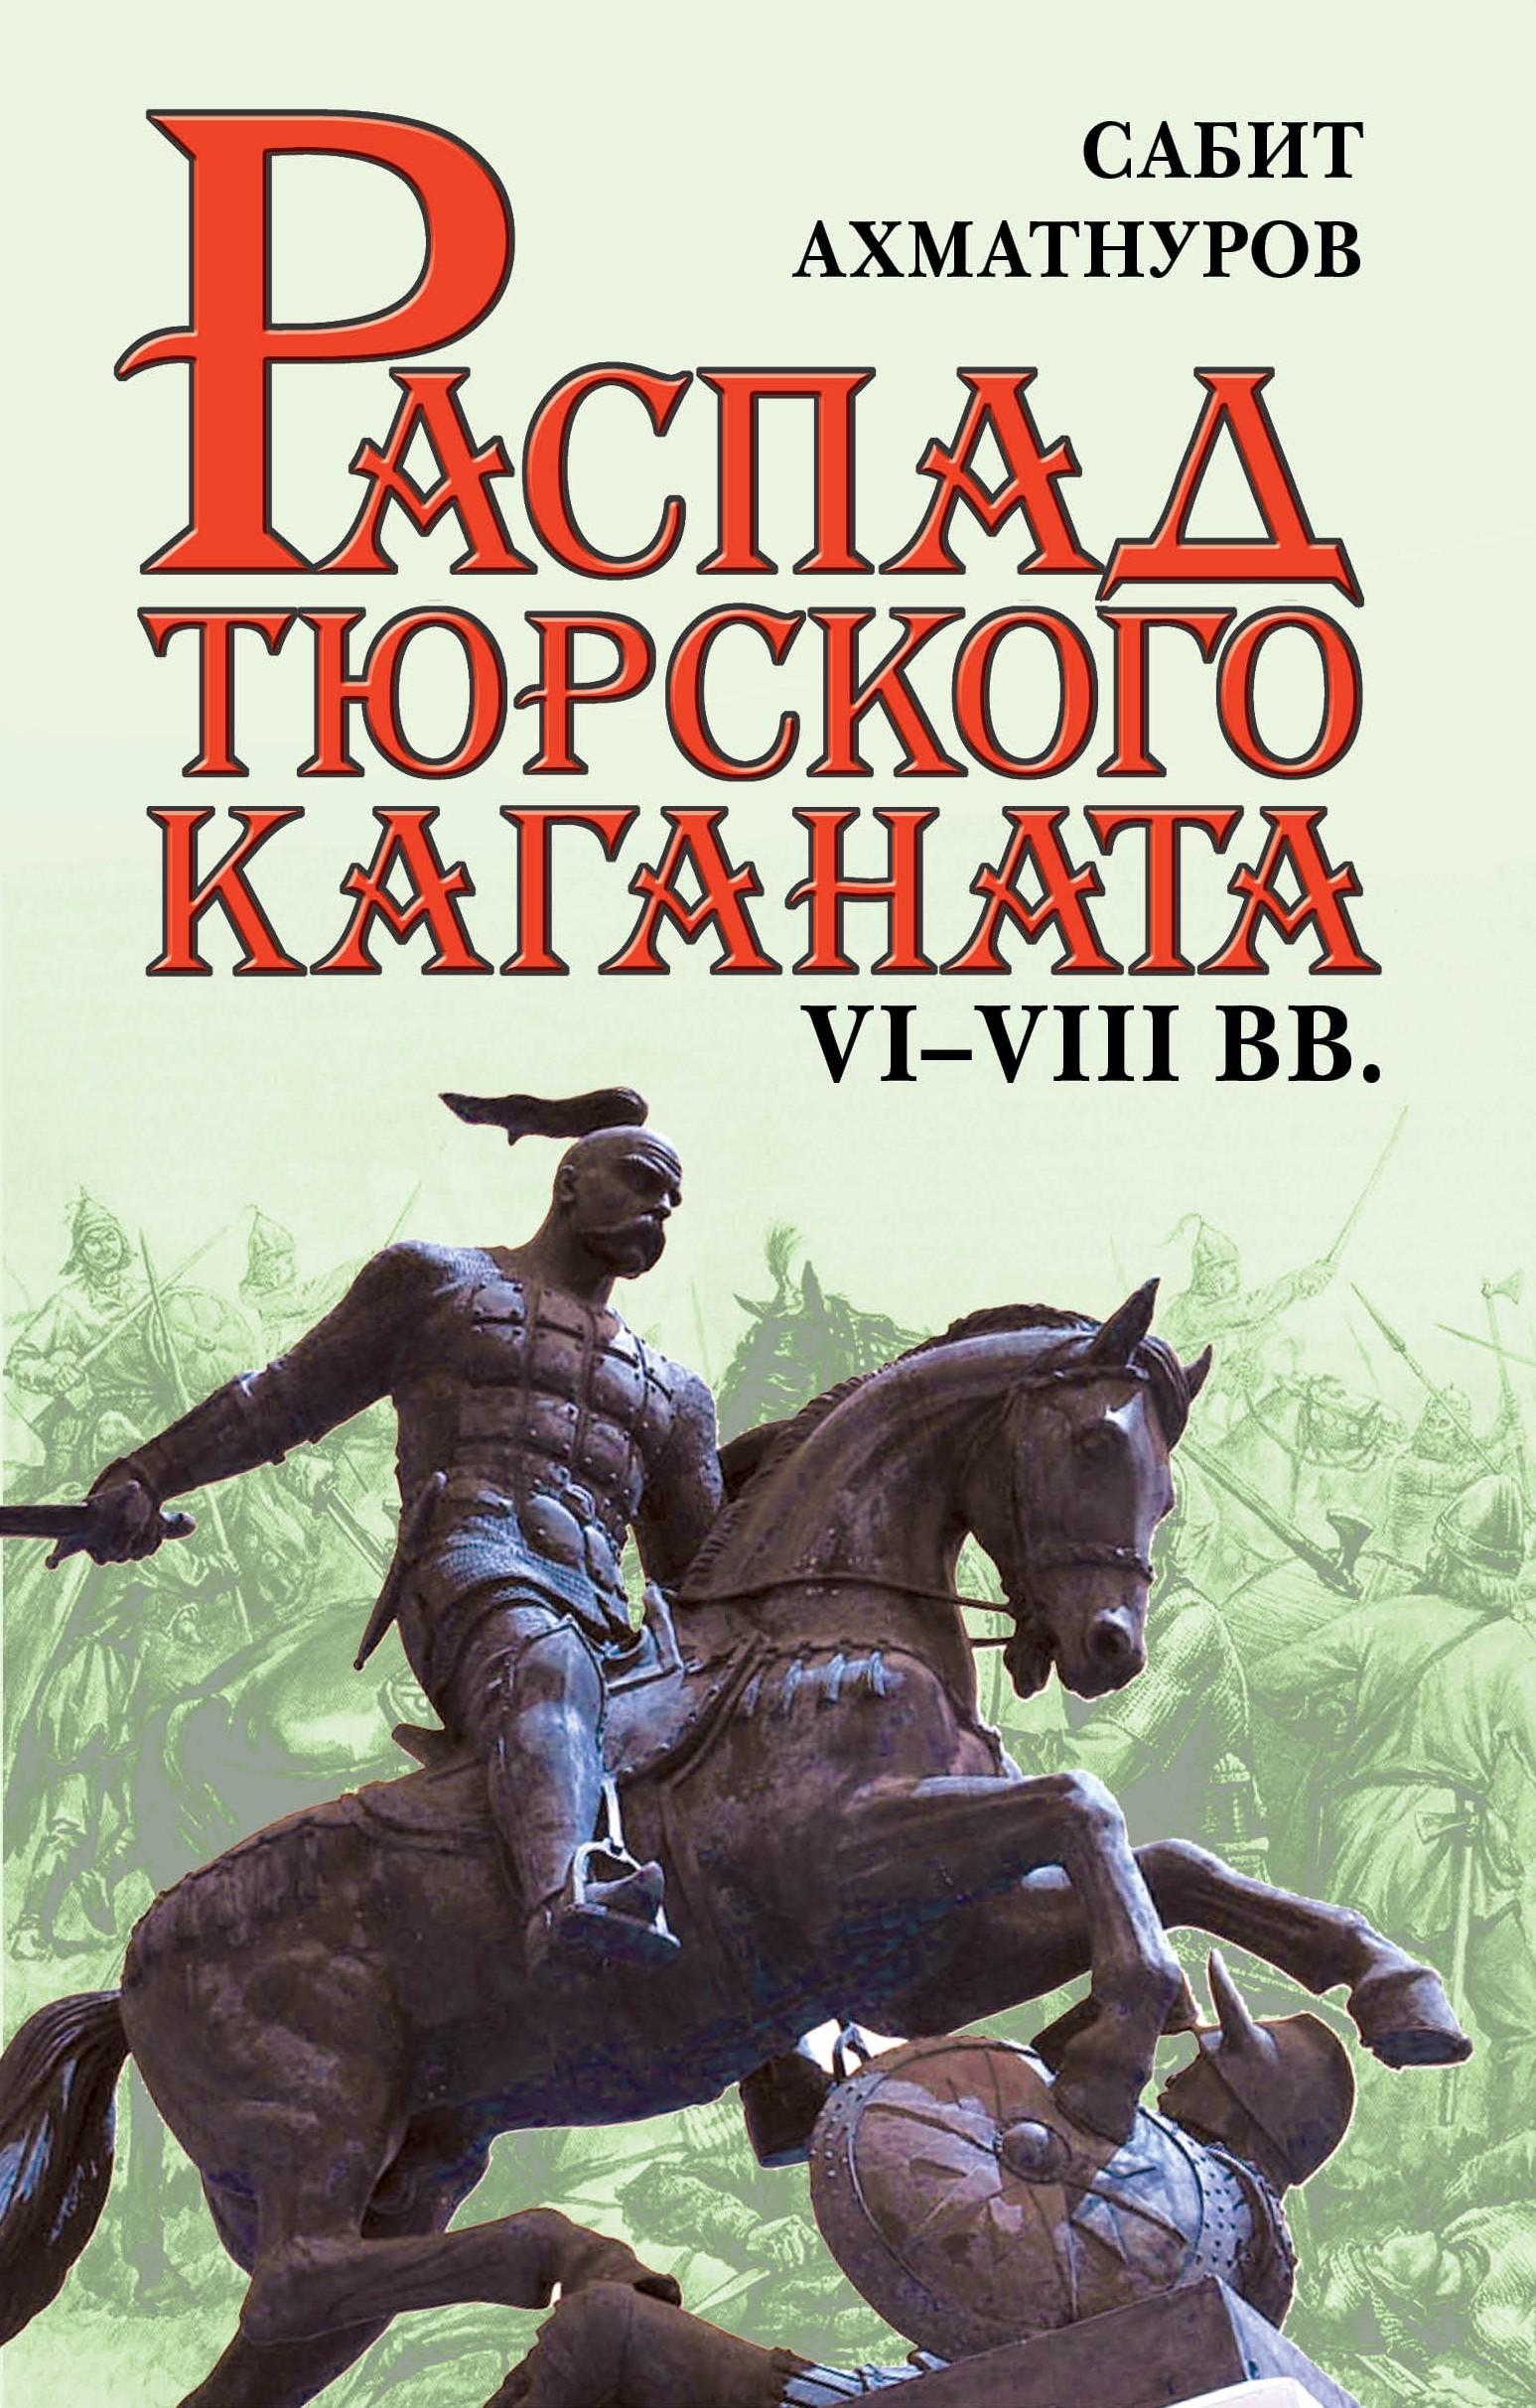 Сабит Ахматнуров Распад Тюркского каганата. VI–VIII вв. сабит ахматнуров великий гунн